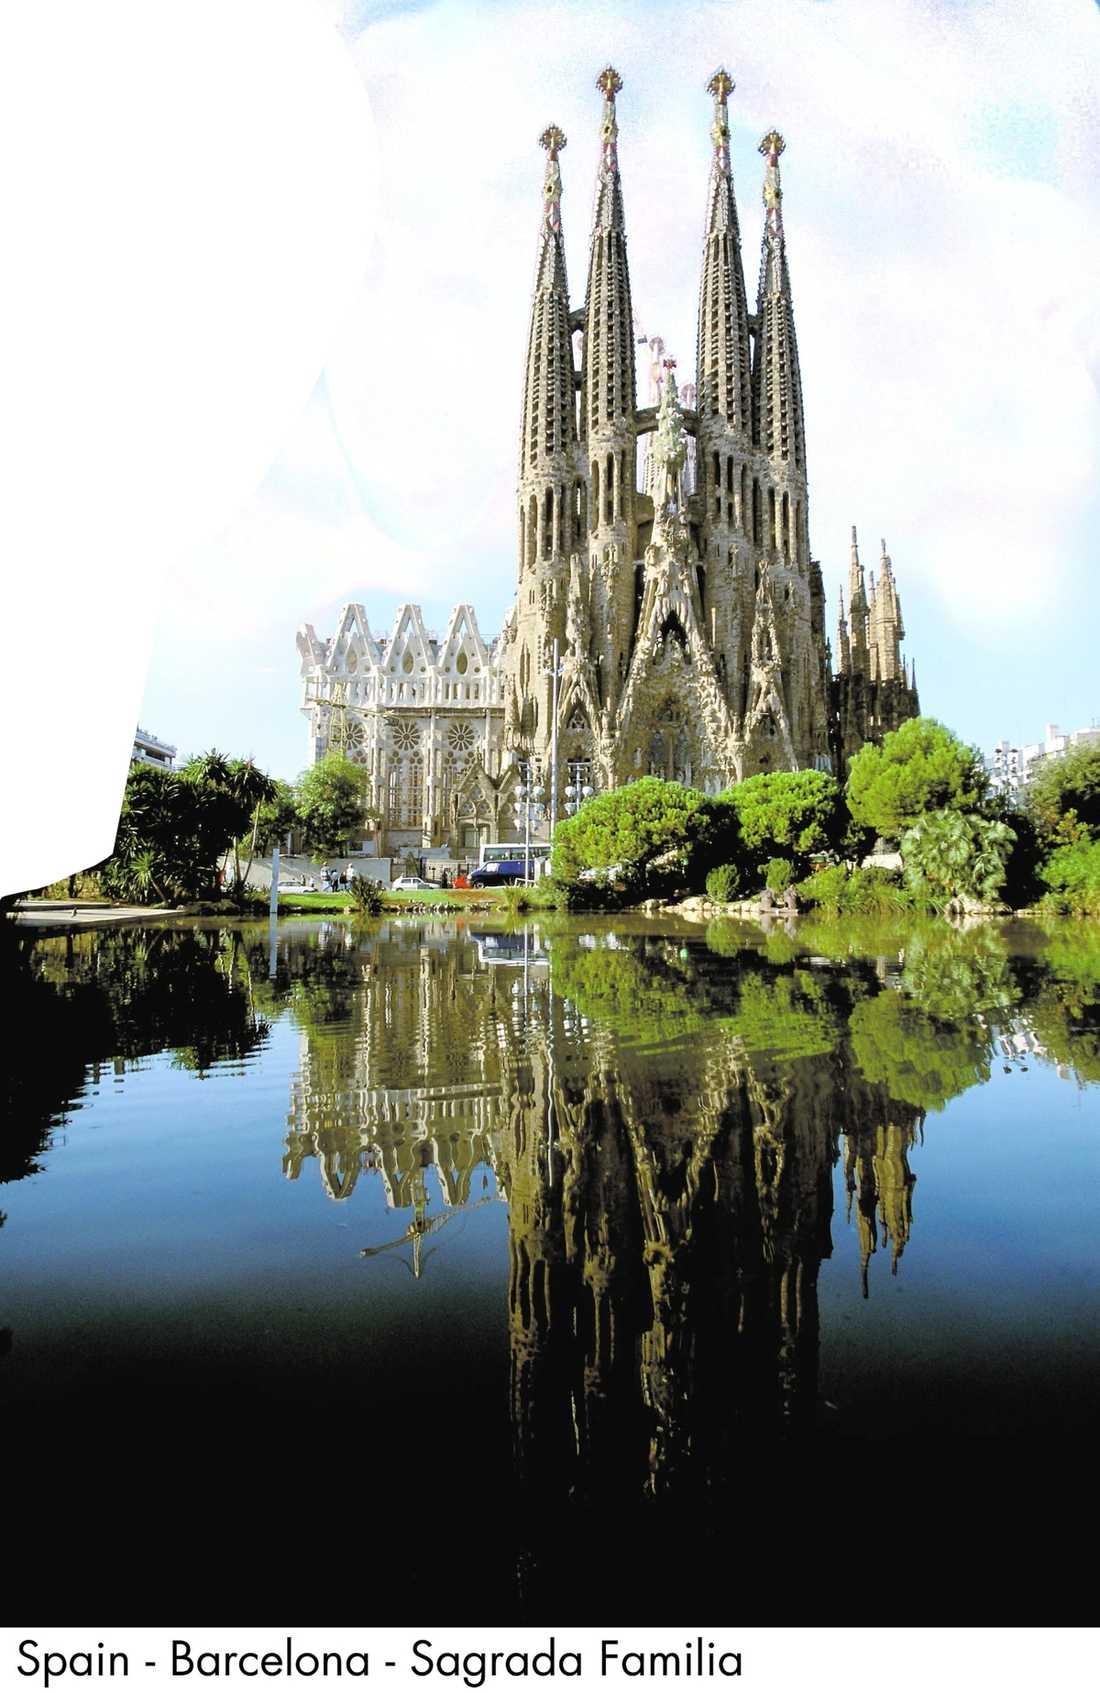 En stad för alla Vandra längs La Rambla eller besök La Sagrada Familia (bilden), Picassomuseet eller Camp Nou.